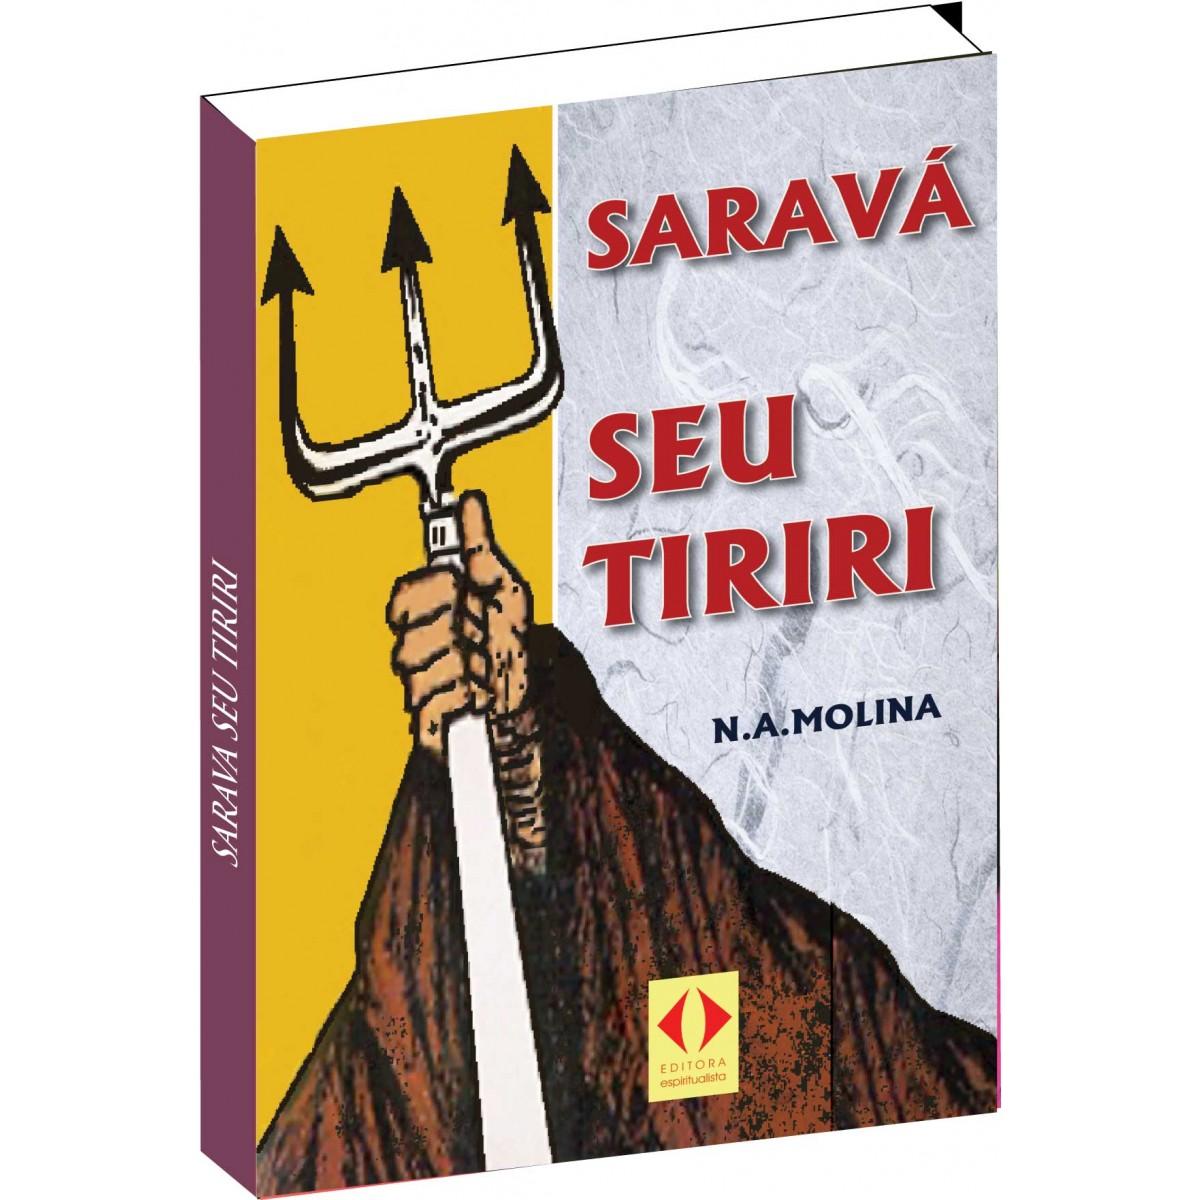 Livro - Saravá seu Tiriri  - Livropostal Editora